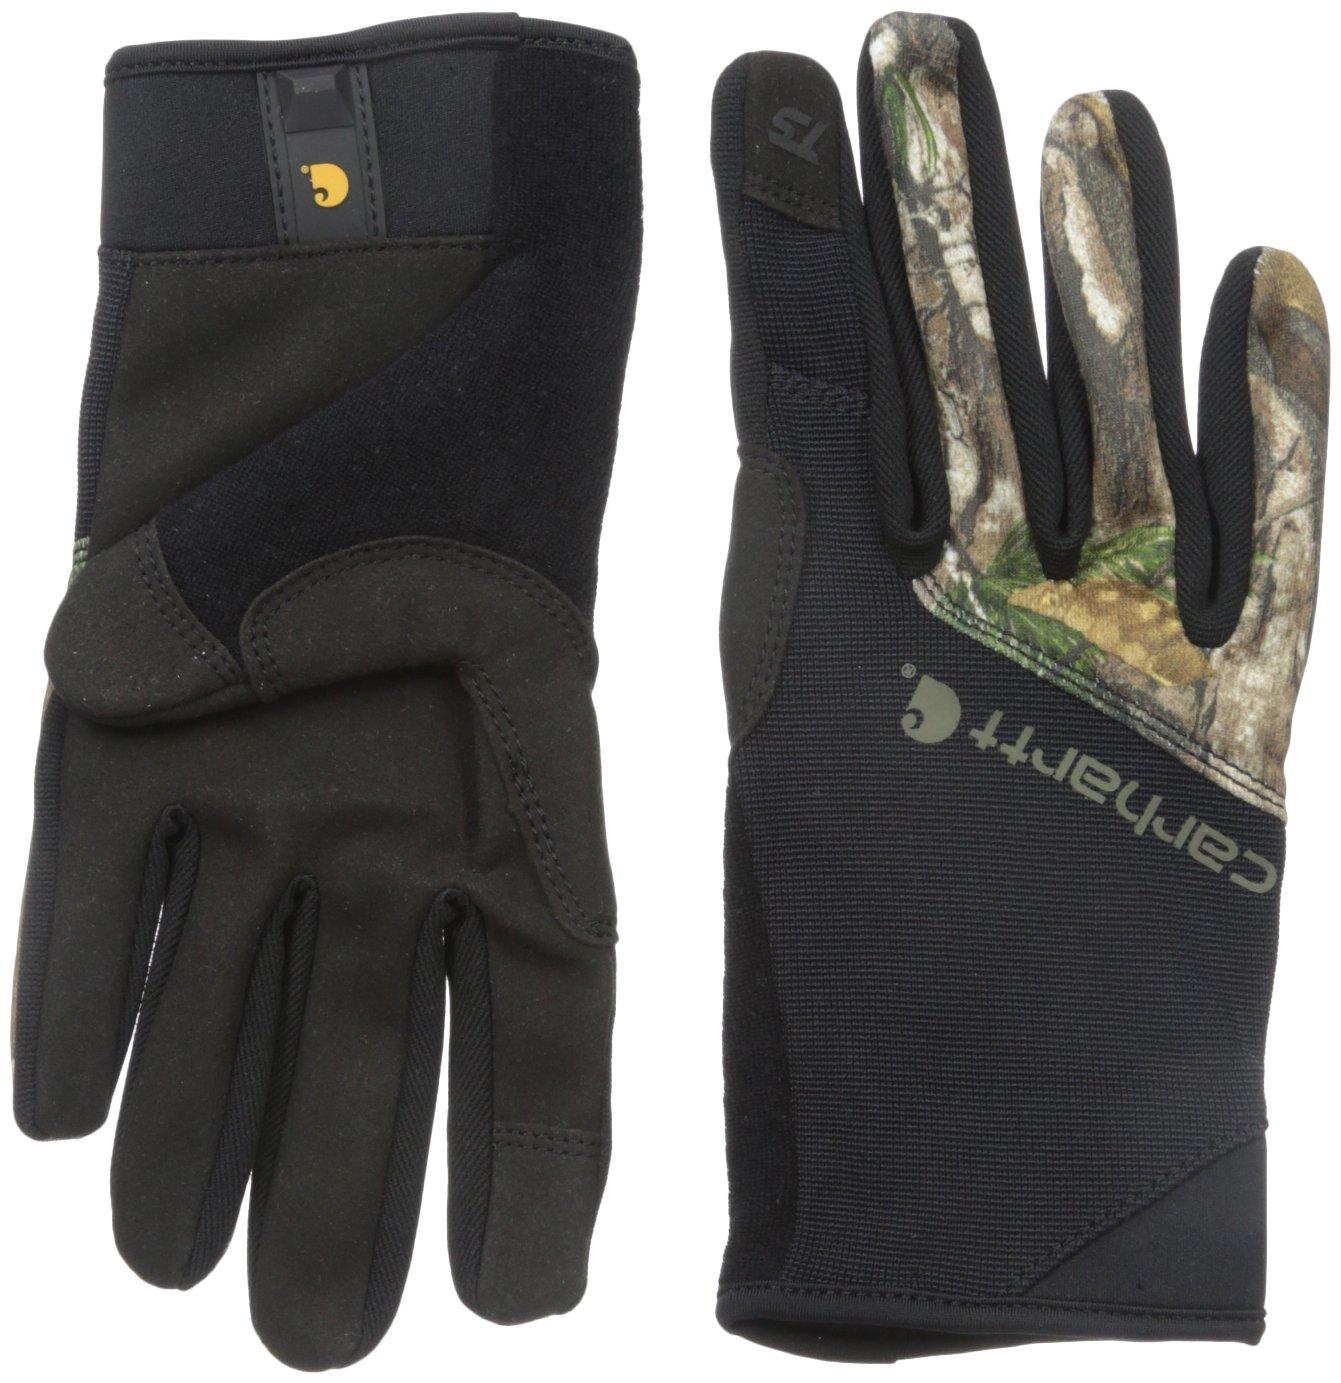 Carhartt Men's Work Flex Touch Glove-Xtra, Black/Extra, X-Large